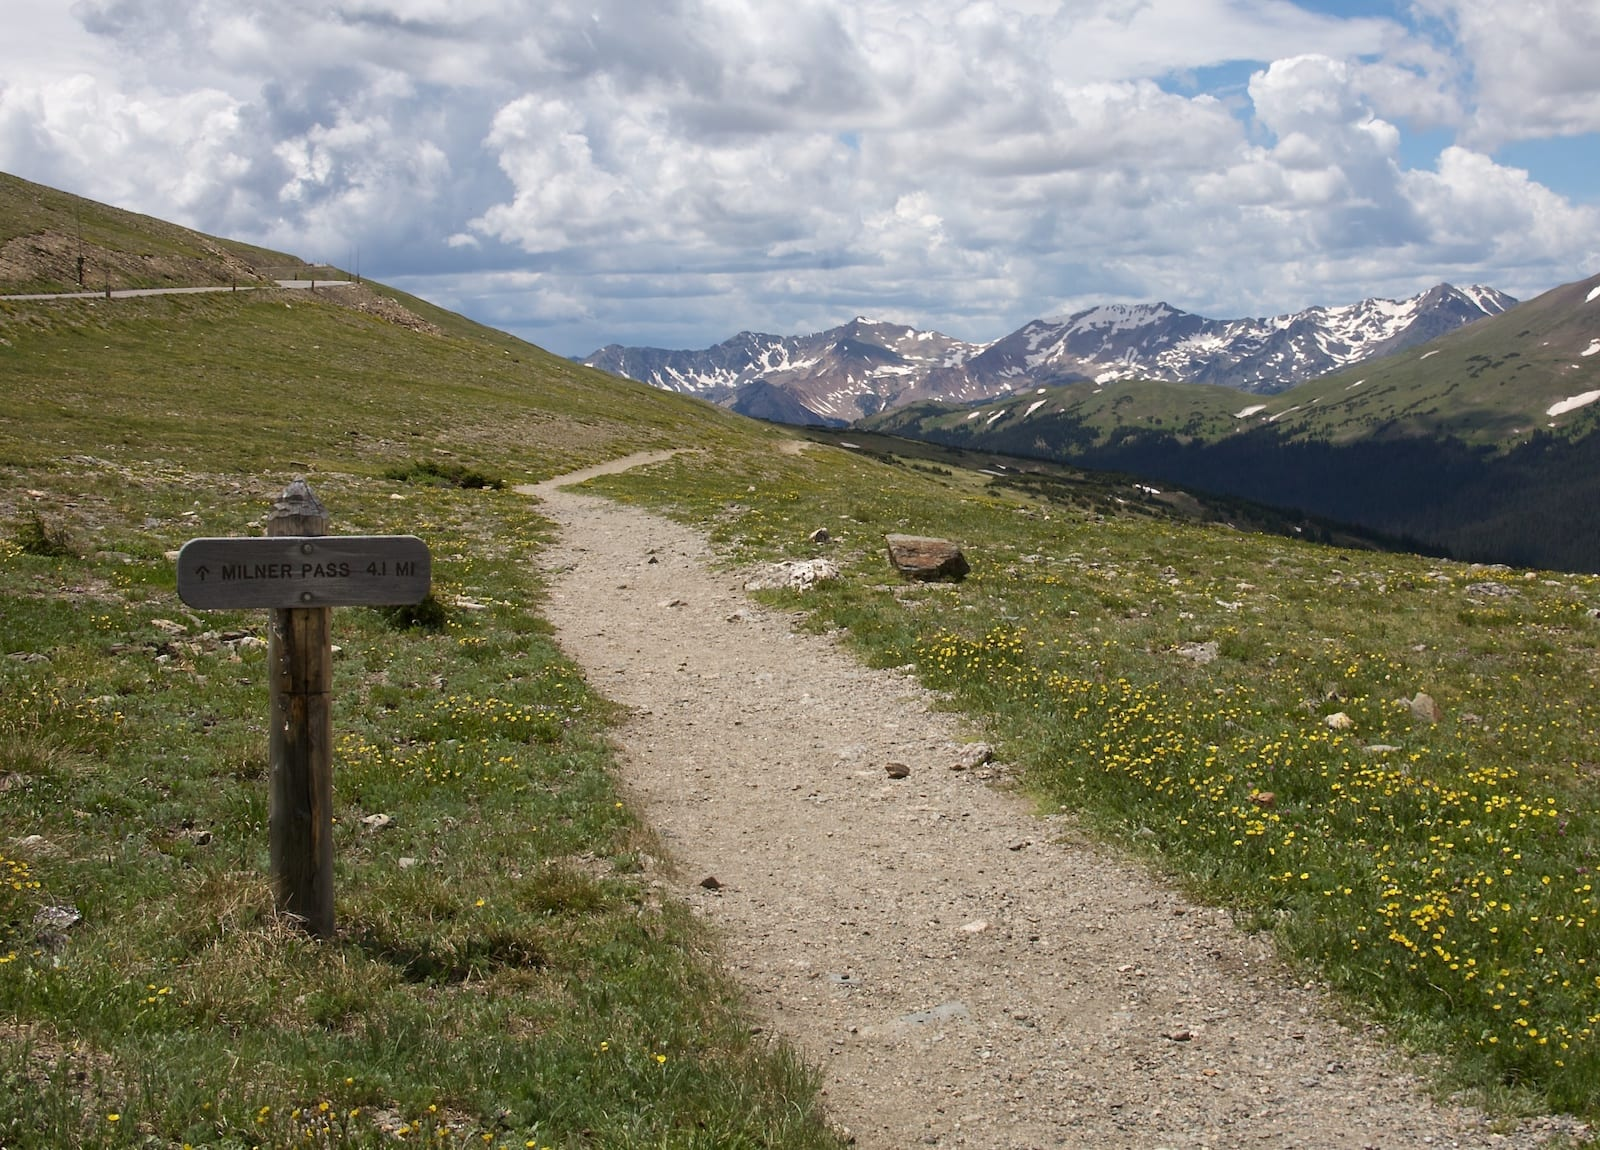 Milner Pass, CO